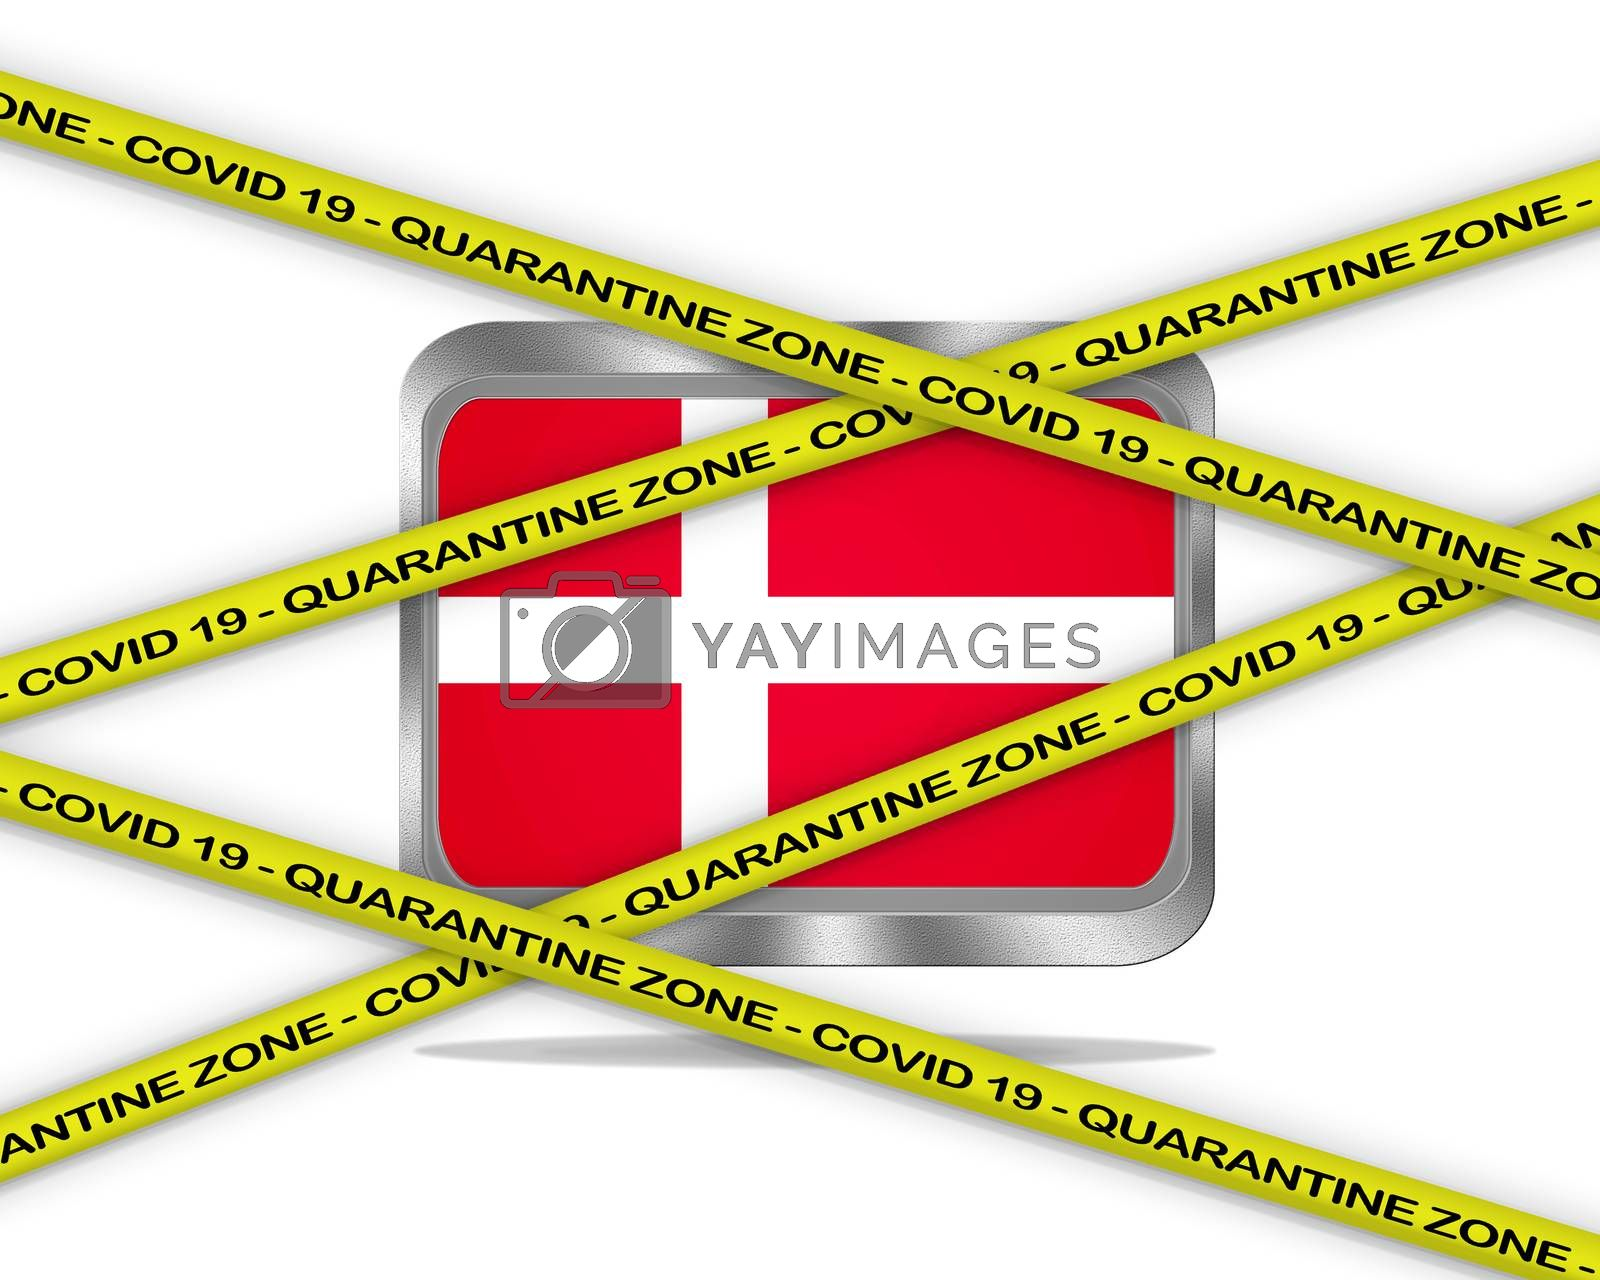 COVID-19 warning yellow ribbon written with: Quarantine zone Cover 19 on Denmark flag illustration. Coronavirus danger area, quarantined country.